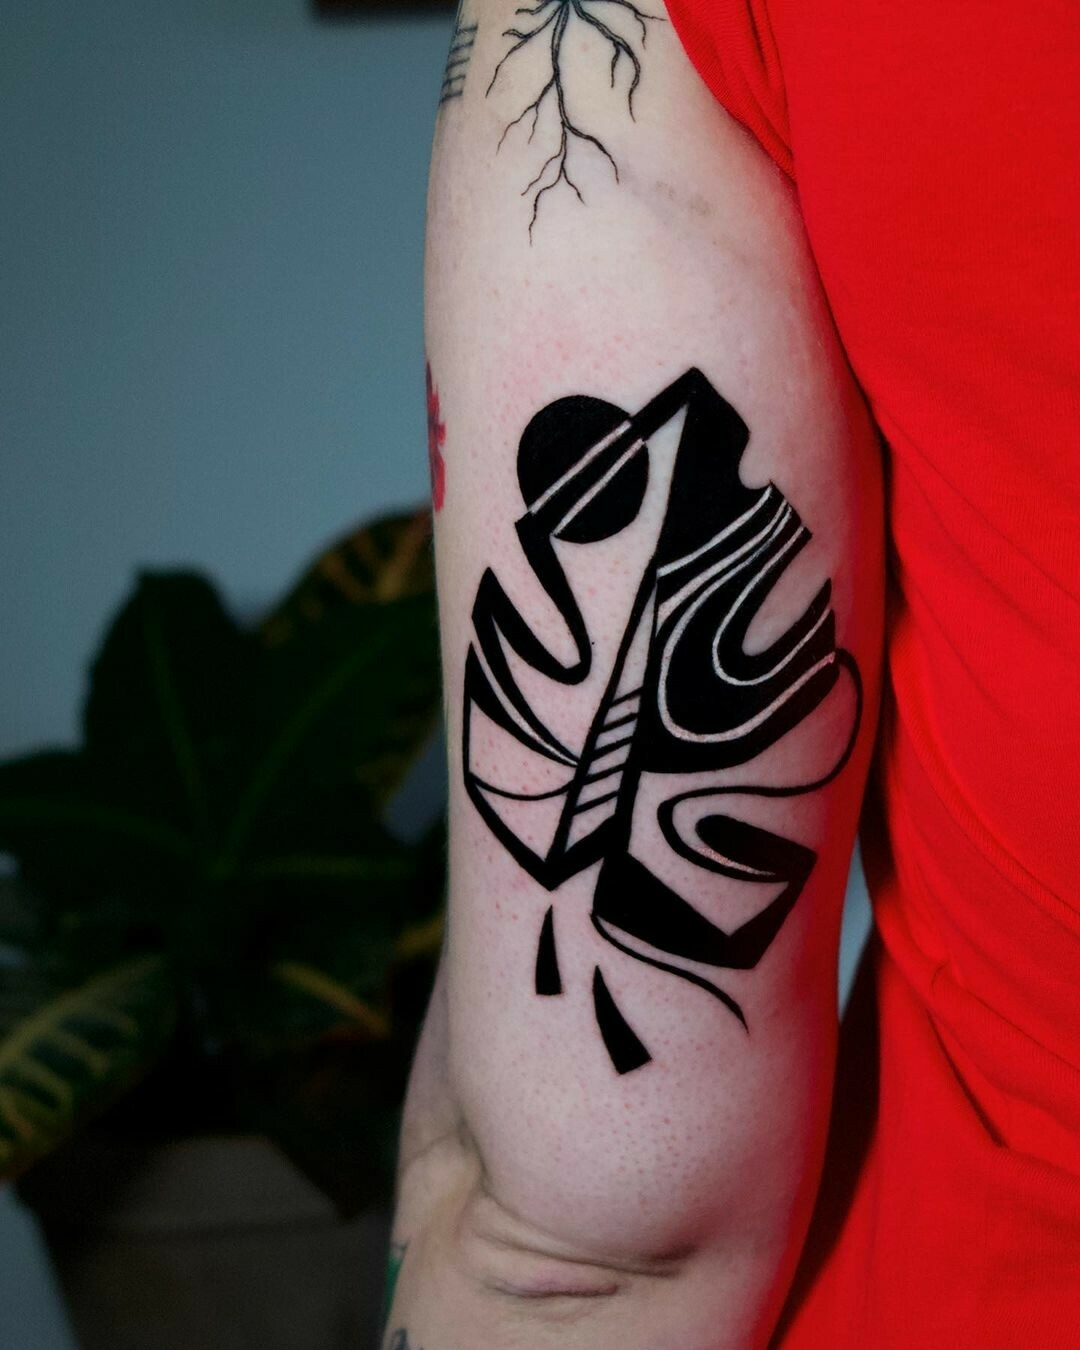 Inksearch tattoo Marta Kudu